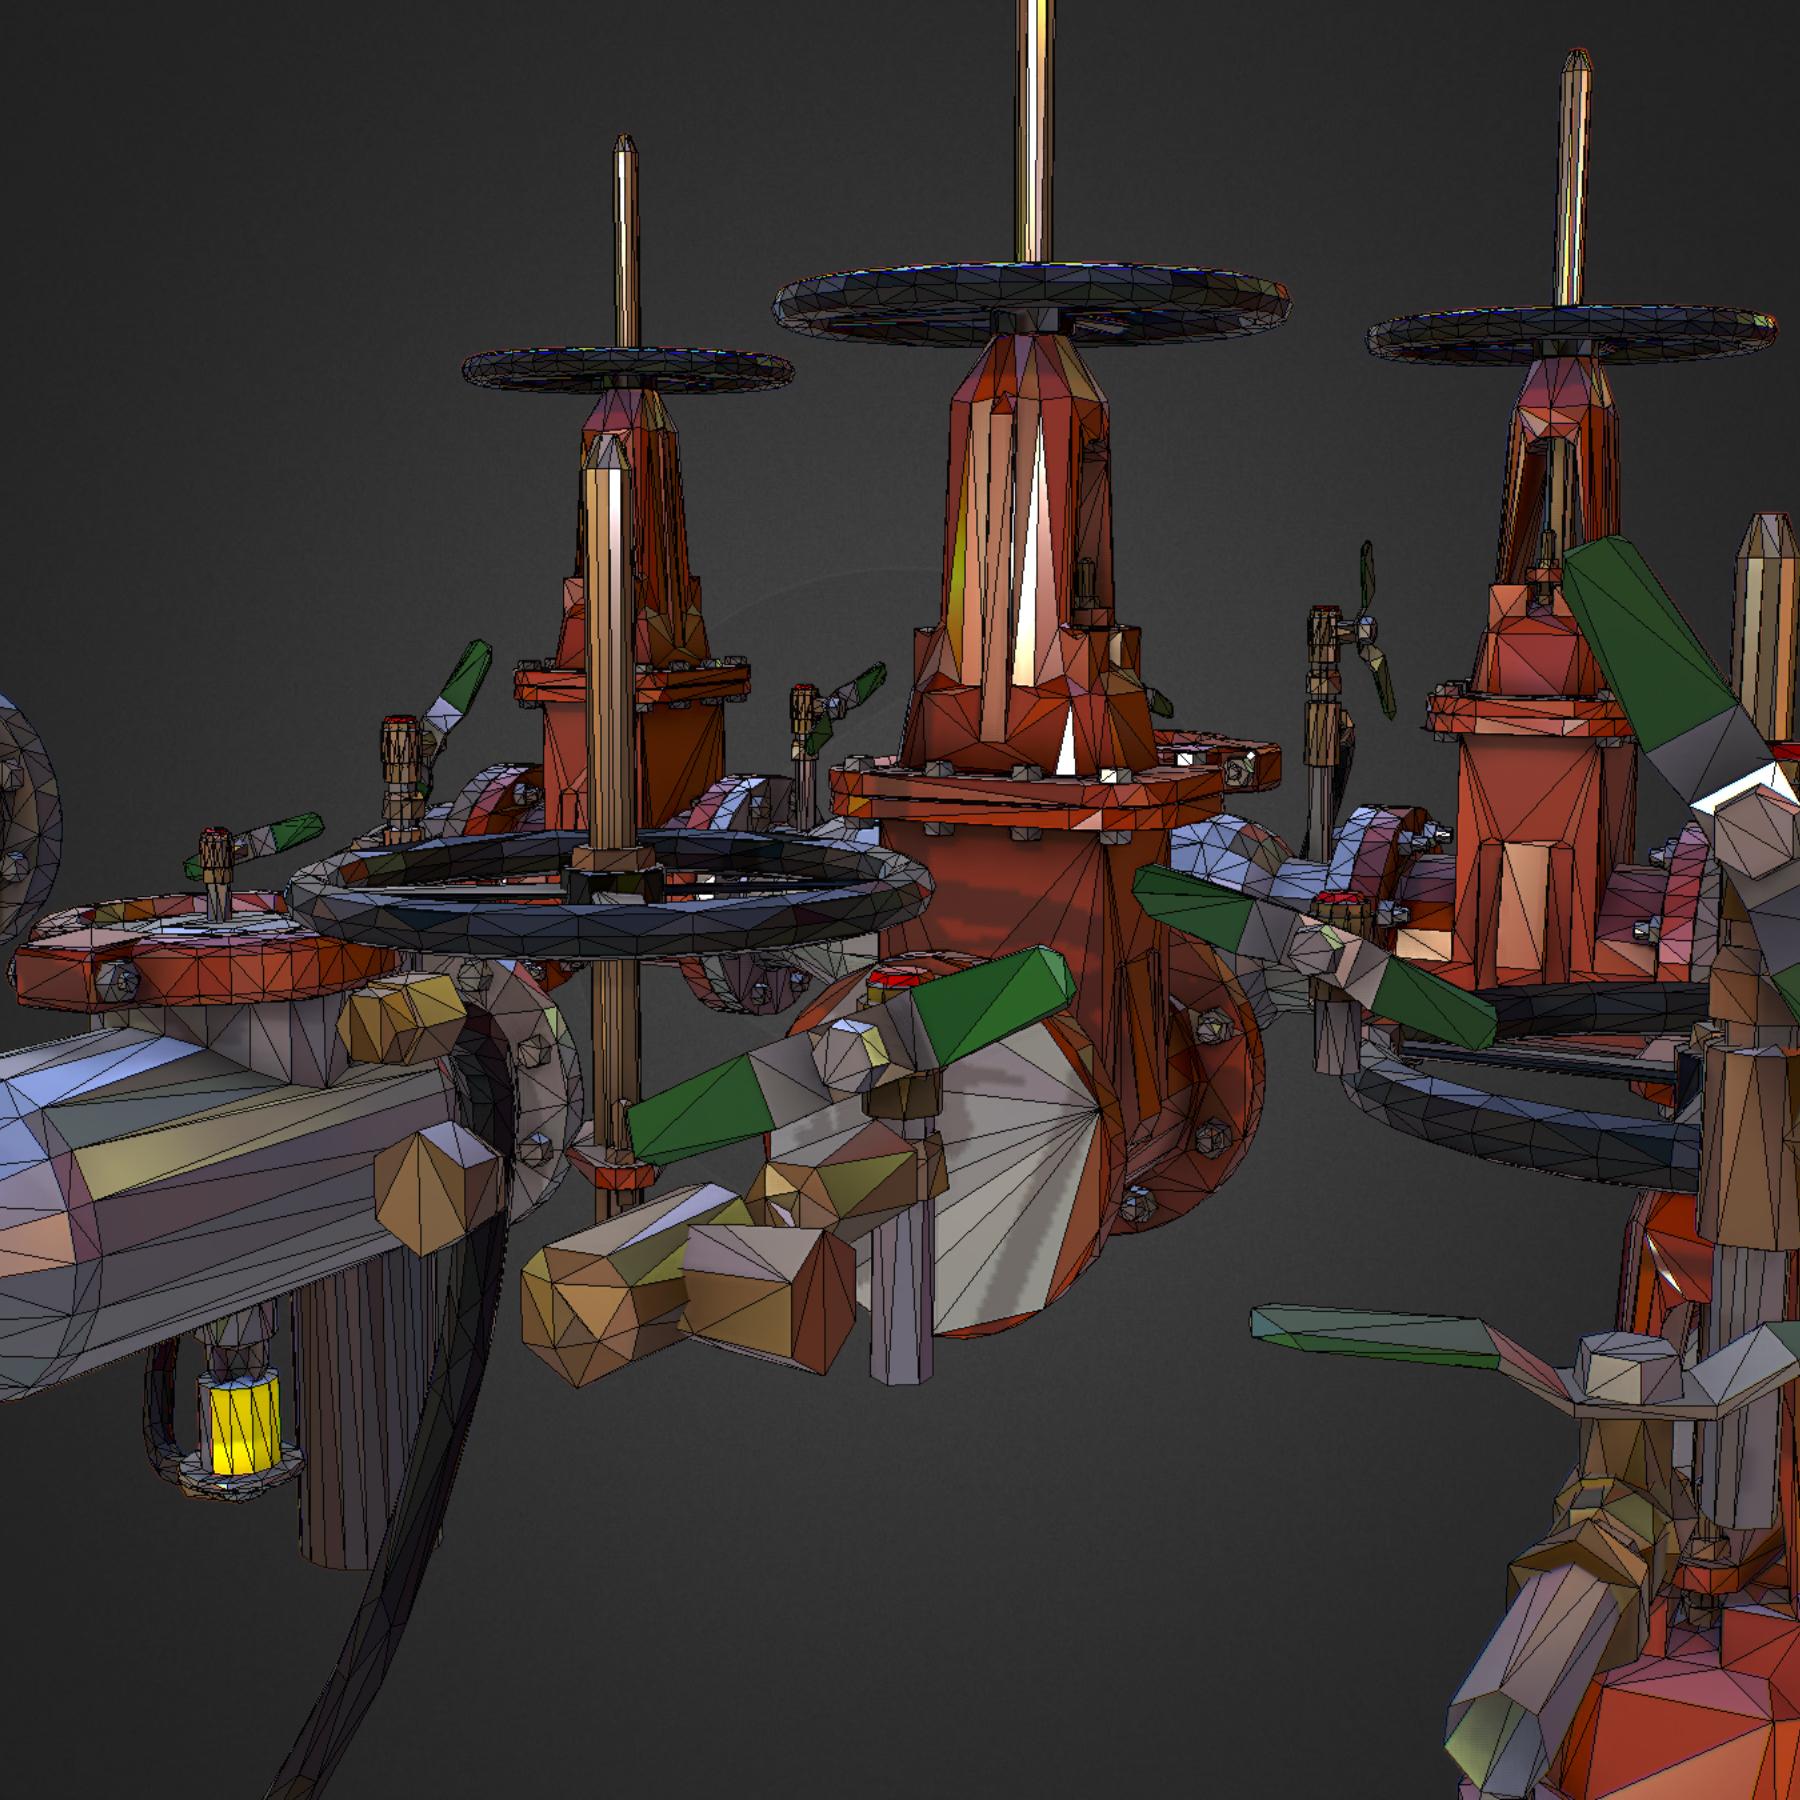 Low Poly ART Backflow Water Pipe Constructor 3d model max 3ds max plugin fbx ma mb tga targa icb vda vst pix obj 272573